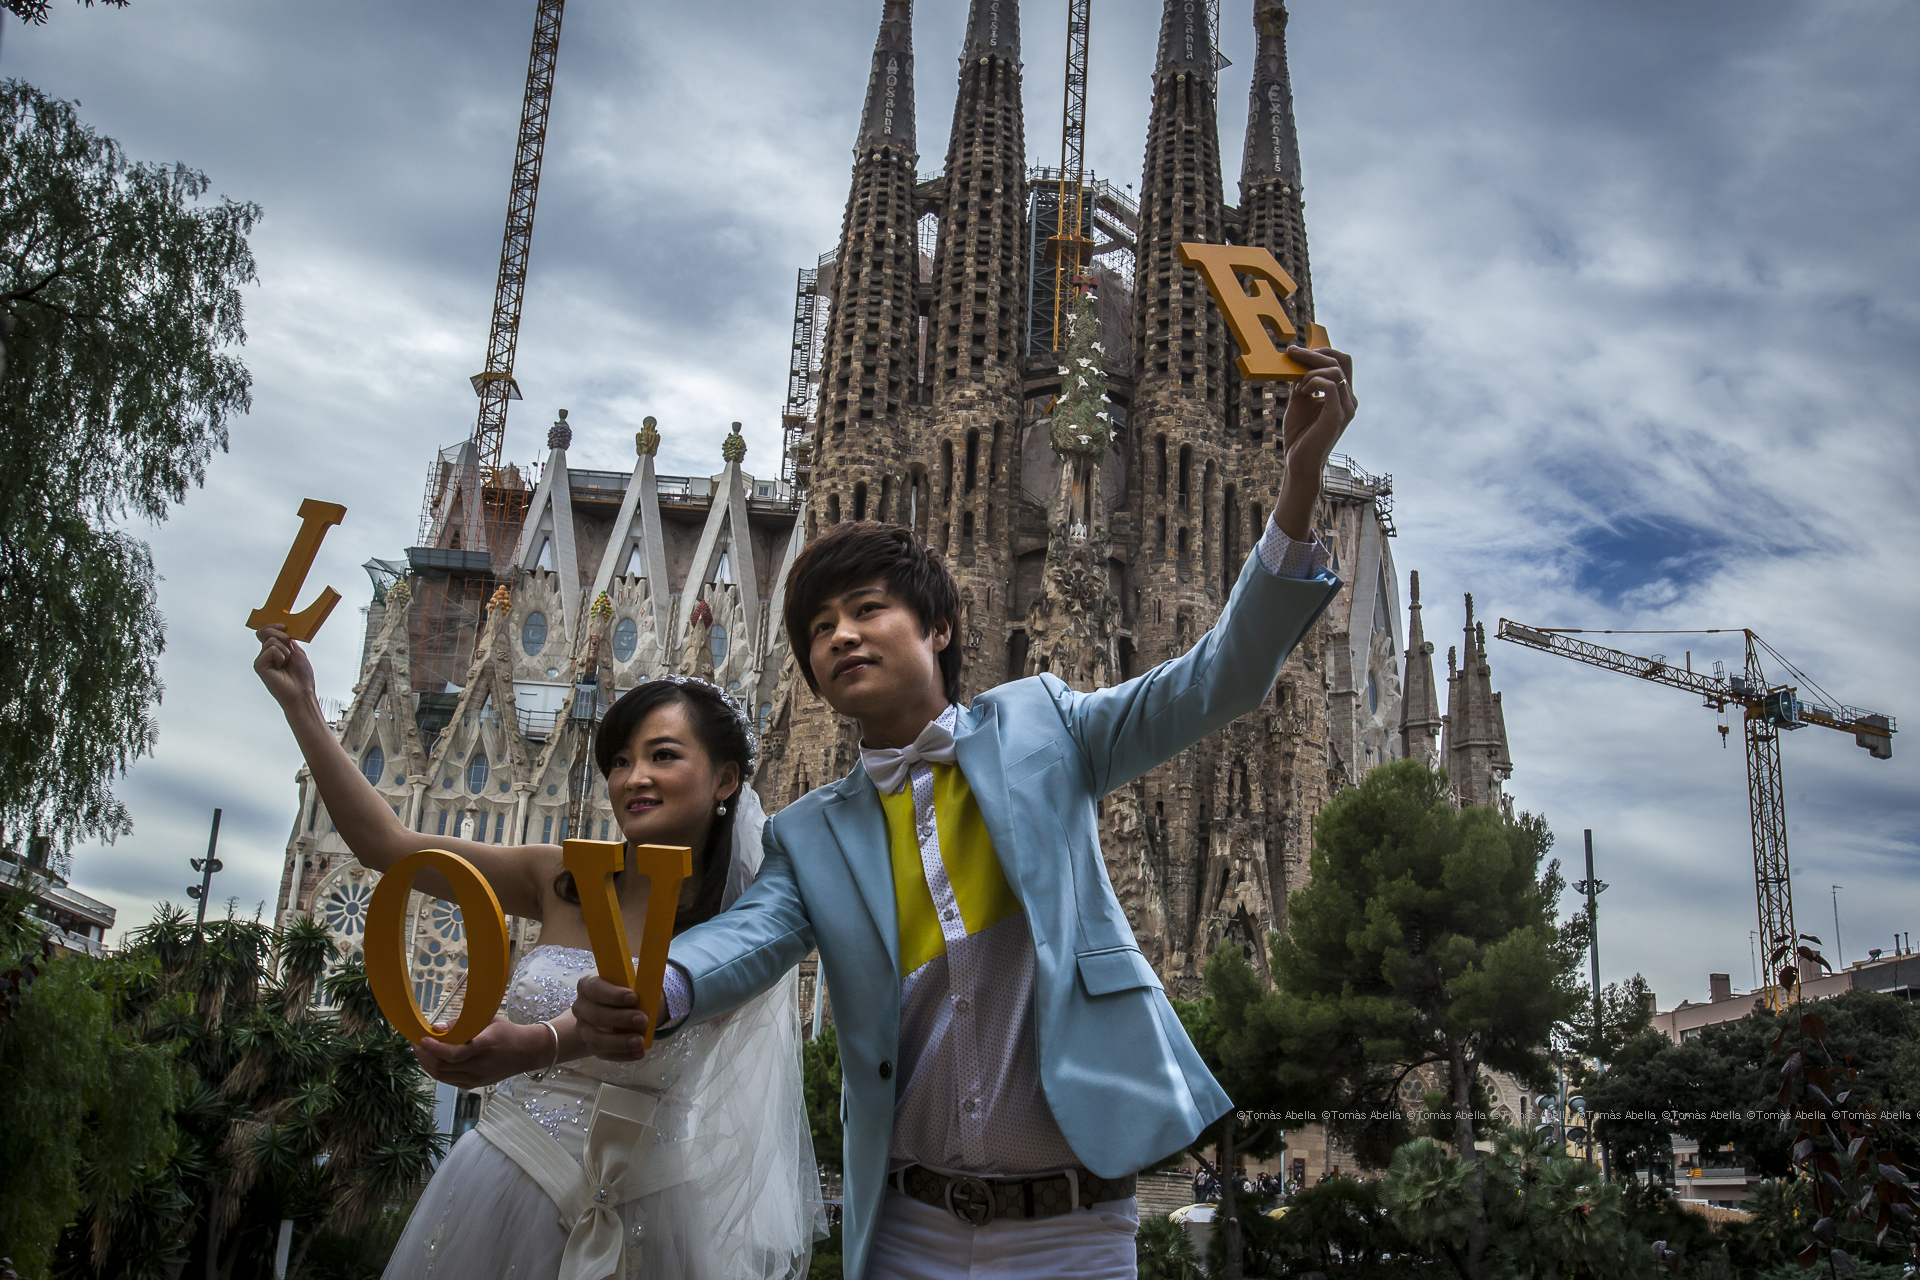 Barcelona_mass tourism